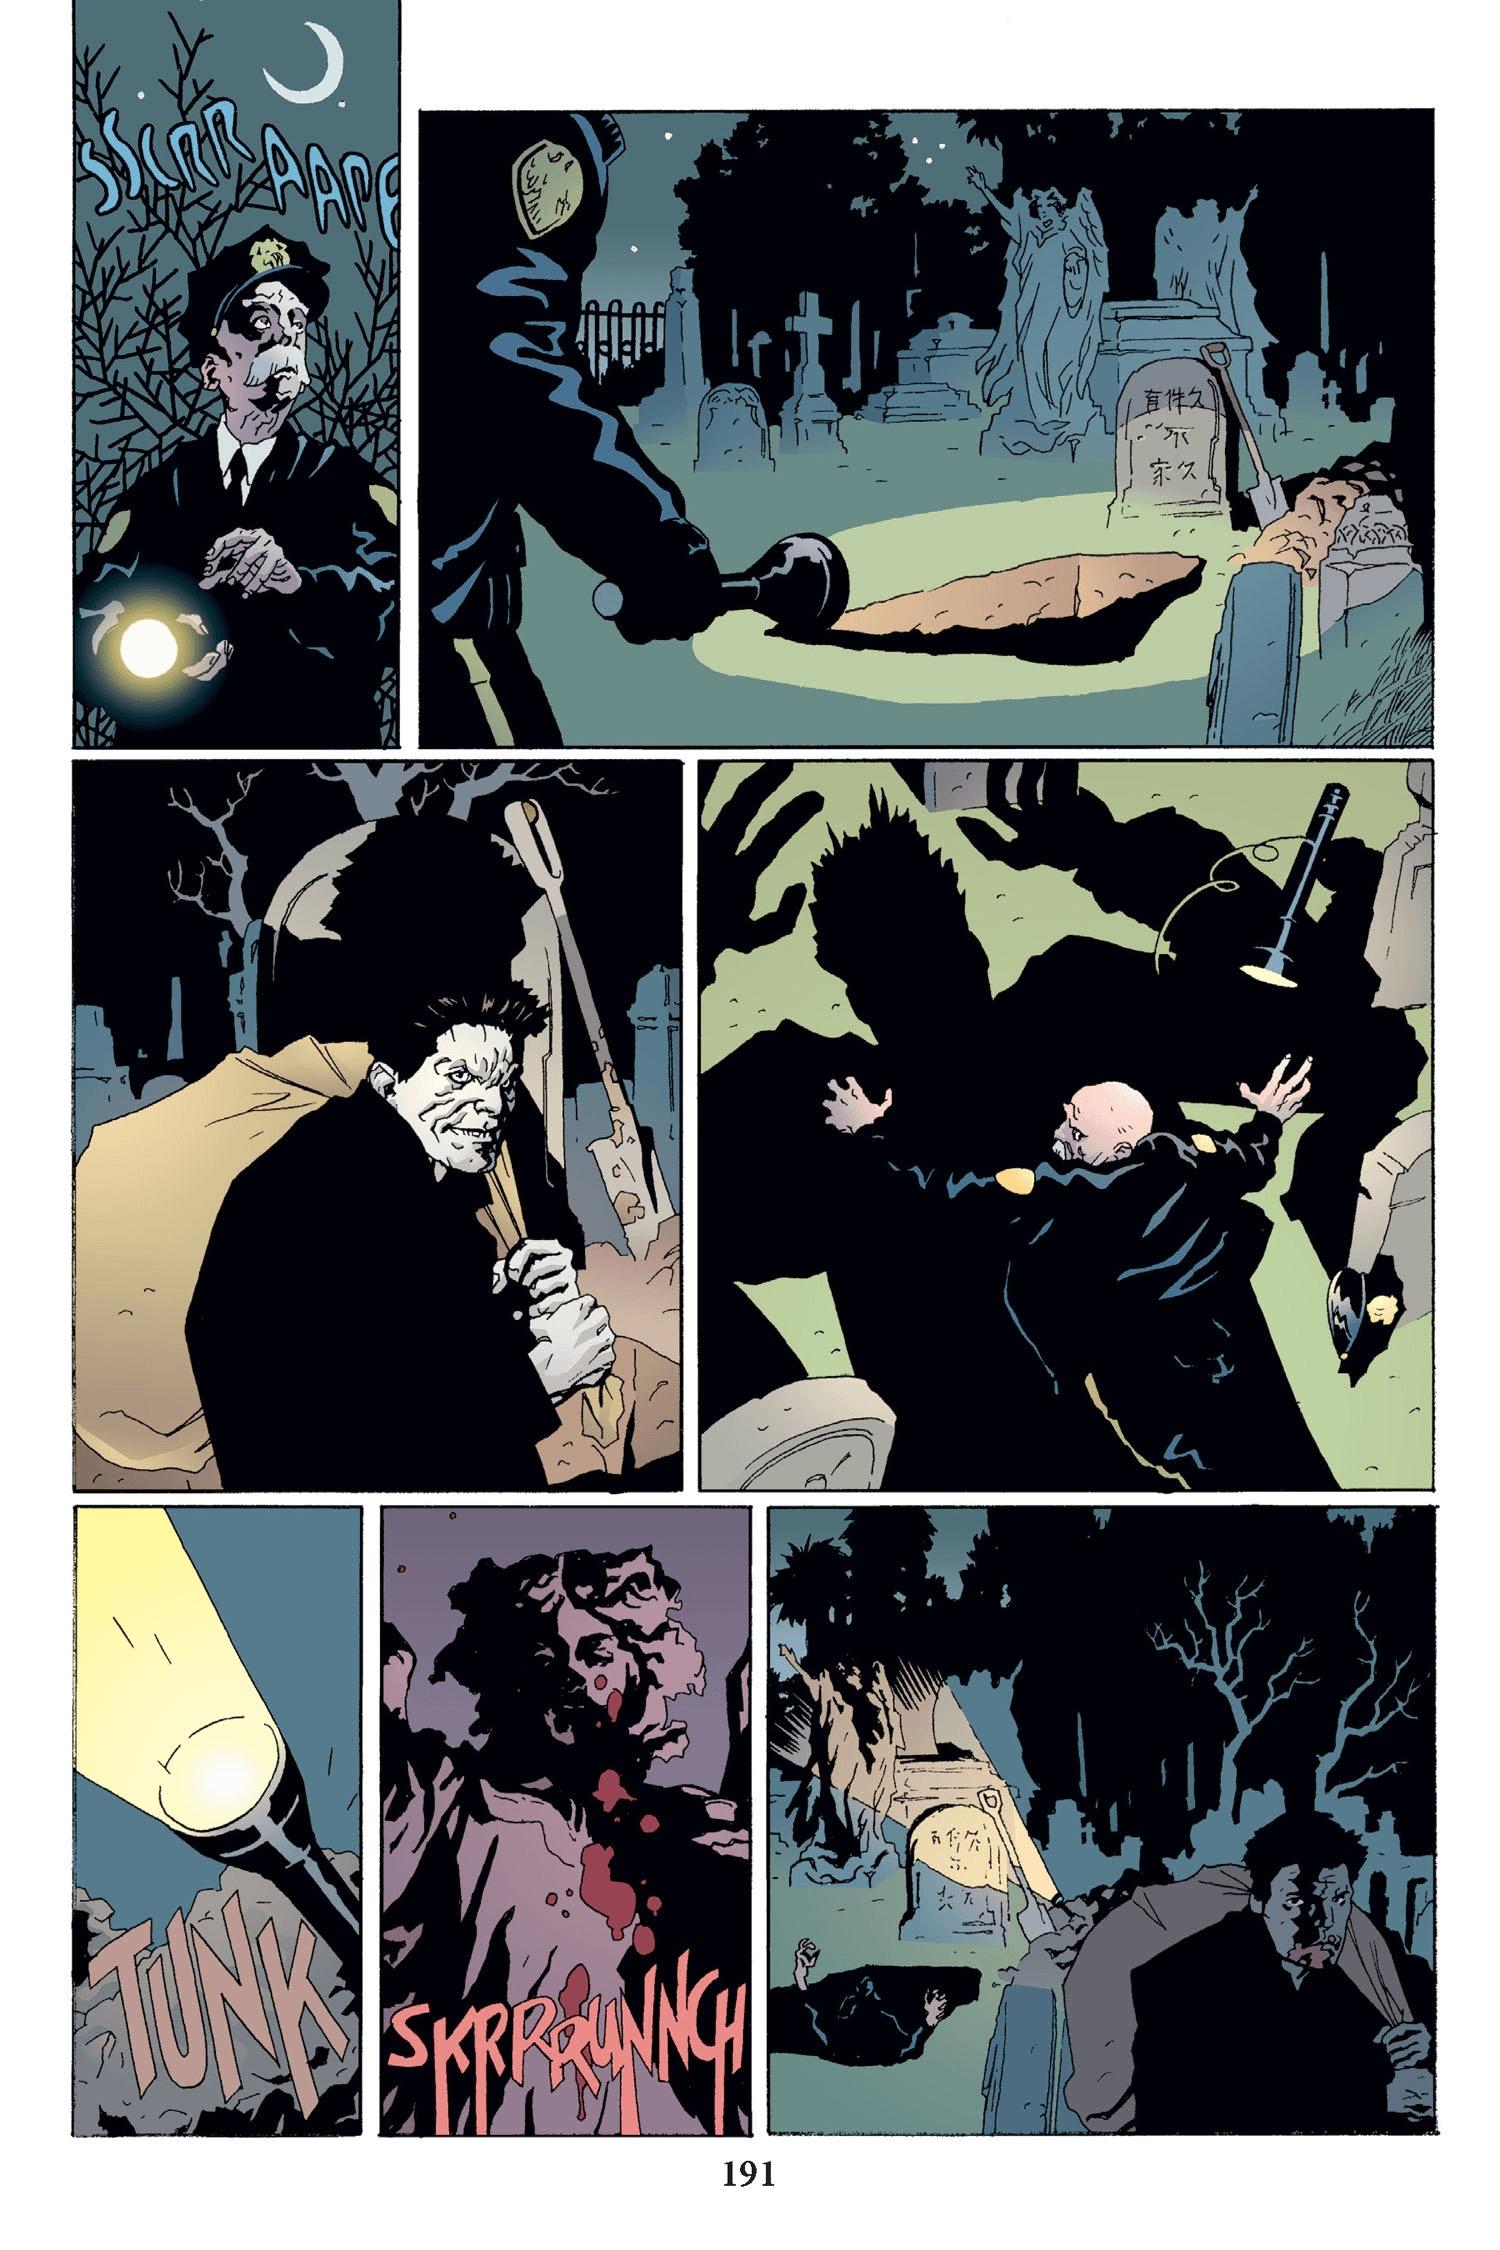 Read online Buffy the Vampire Slayer: Omnibus comic -  Issue # TPB 2 - 185